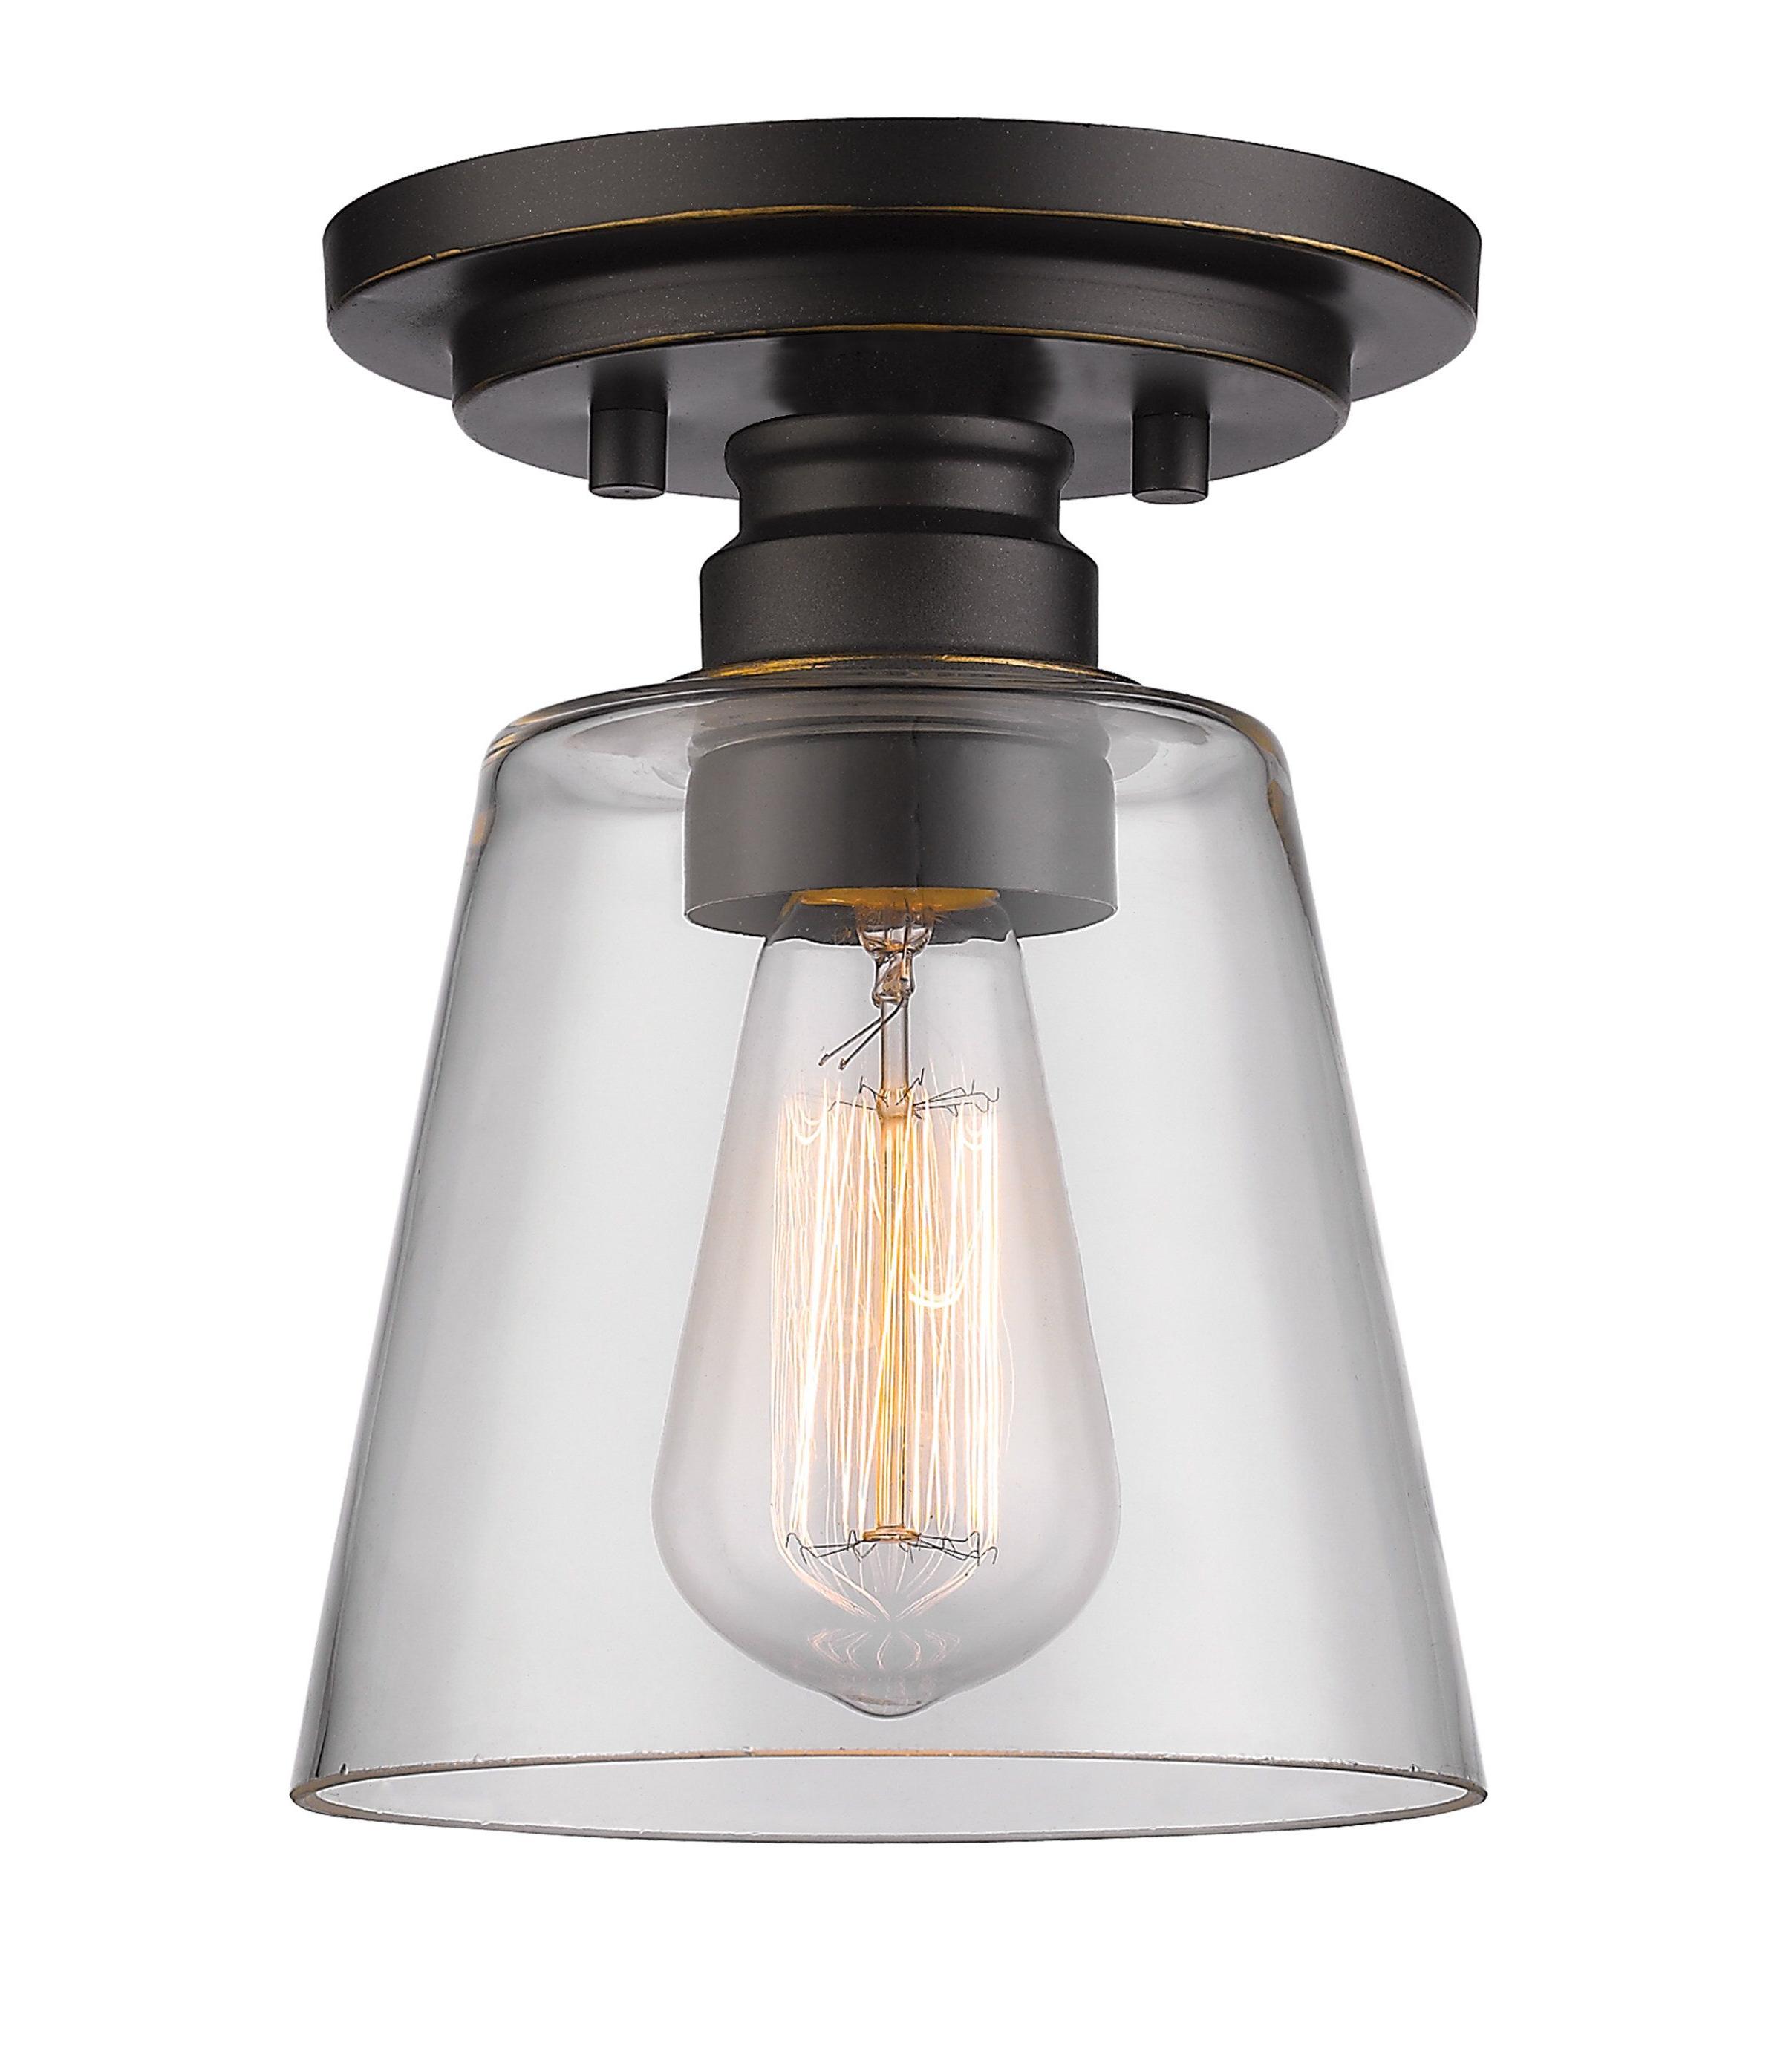 Trendy Erico 1 Light Single Bell Pendants Regarding Clayton 1 Light Semi Flush Mount (View 19 of 20)